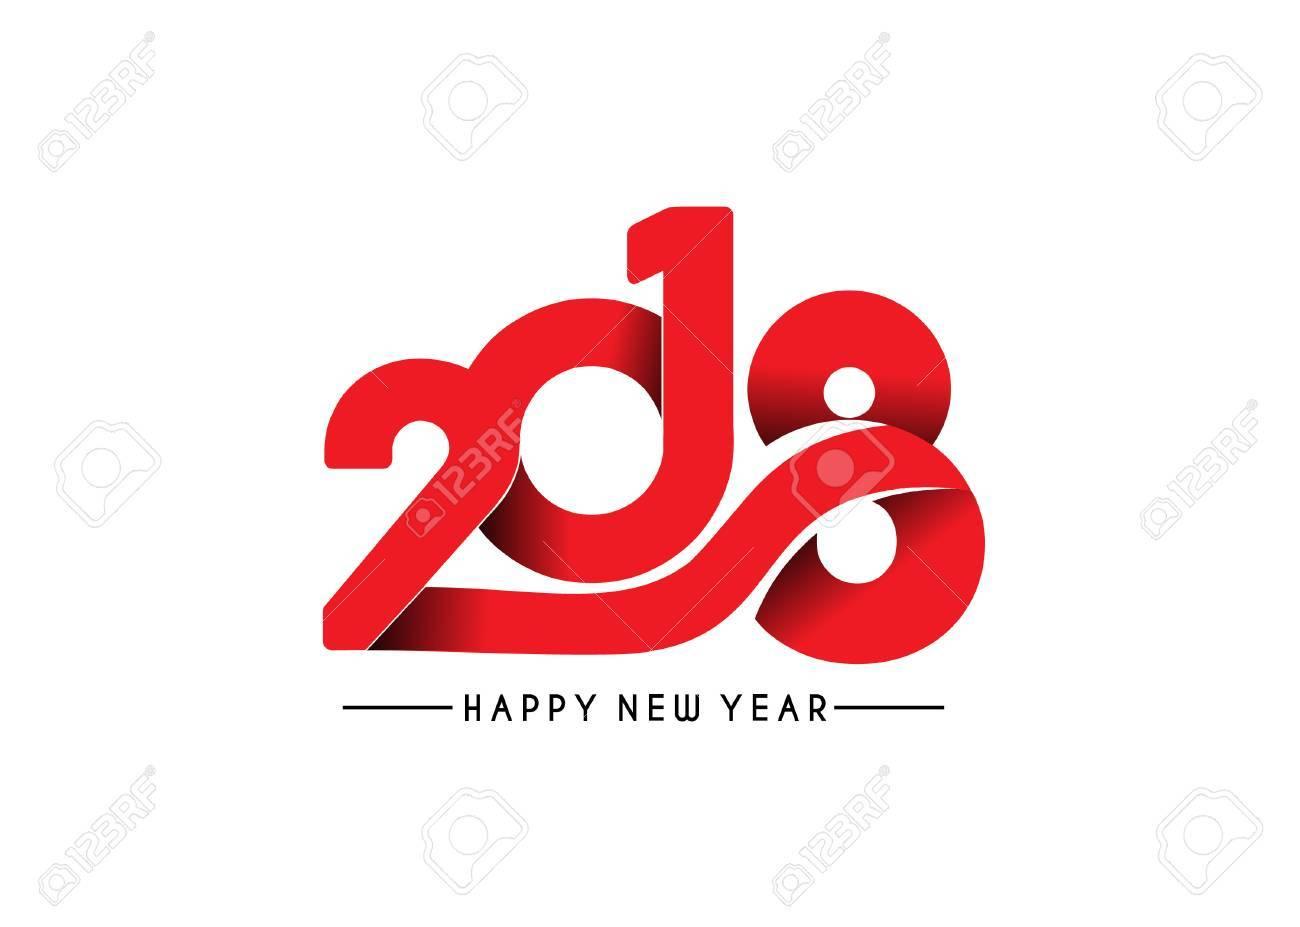 Happy new year 2018 Text Design, Vector illustration. Stock Vector - 89612851